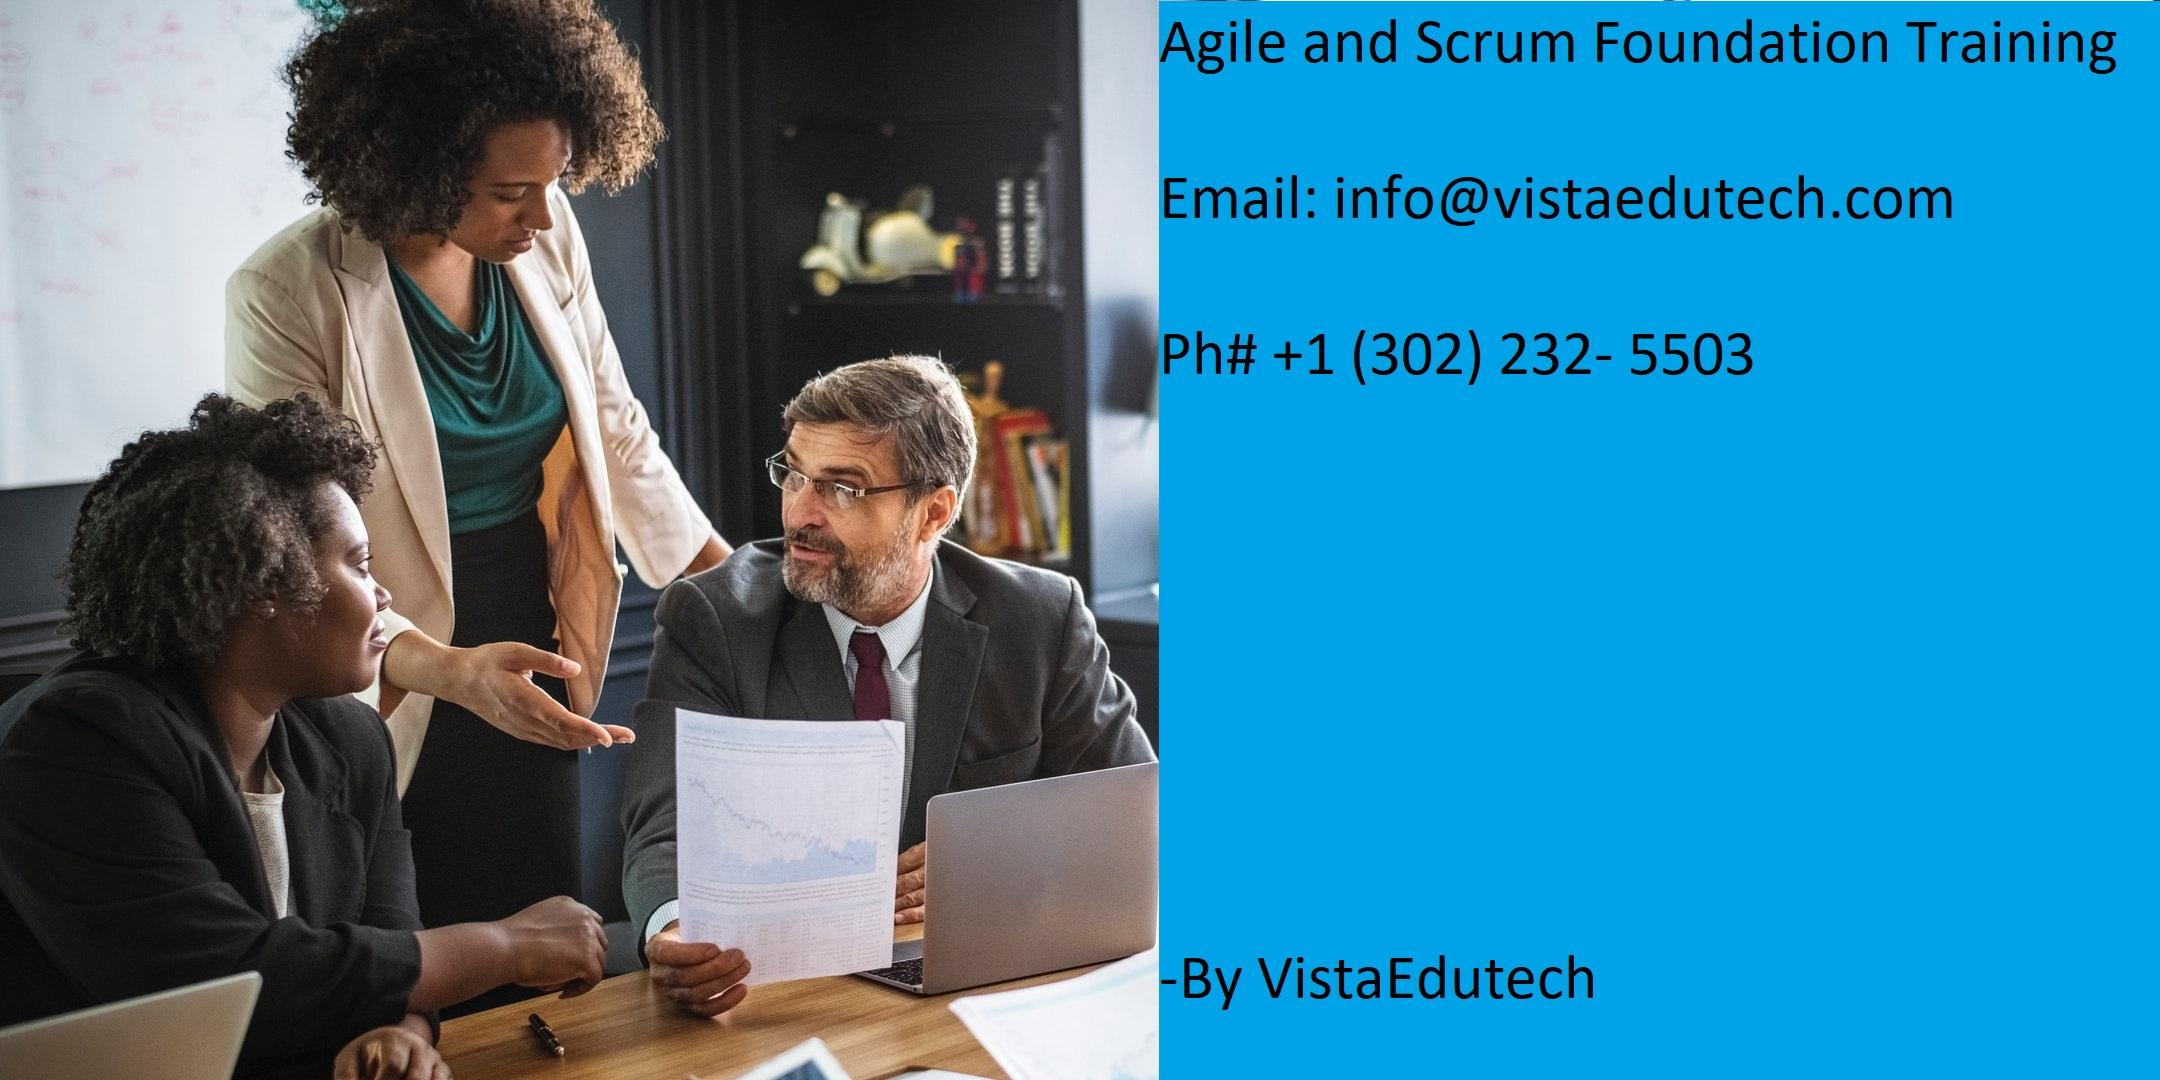 Agile & Scrum Classroom Training in Boise, ID